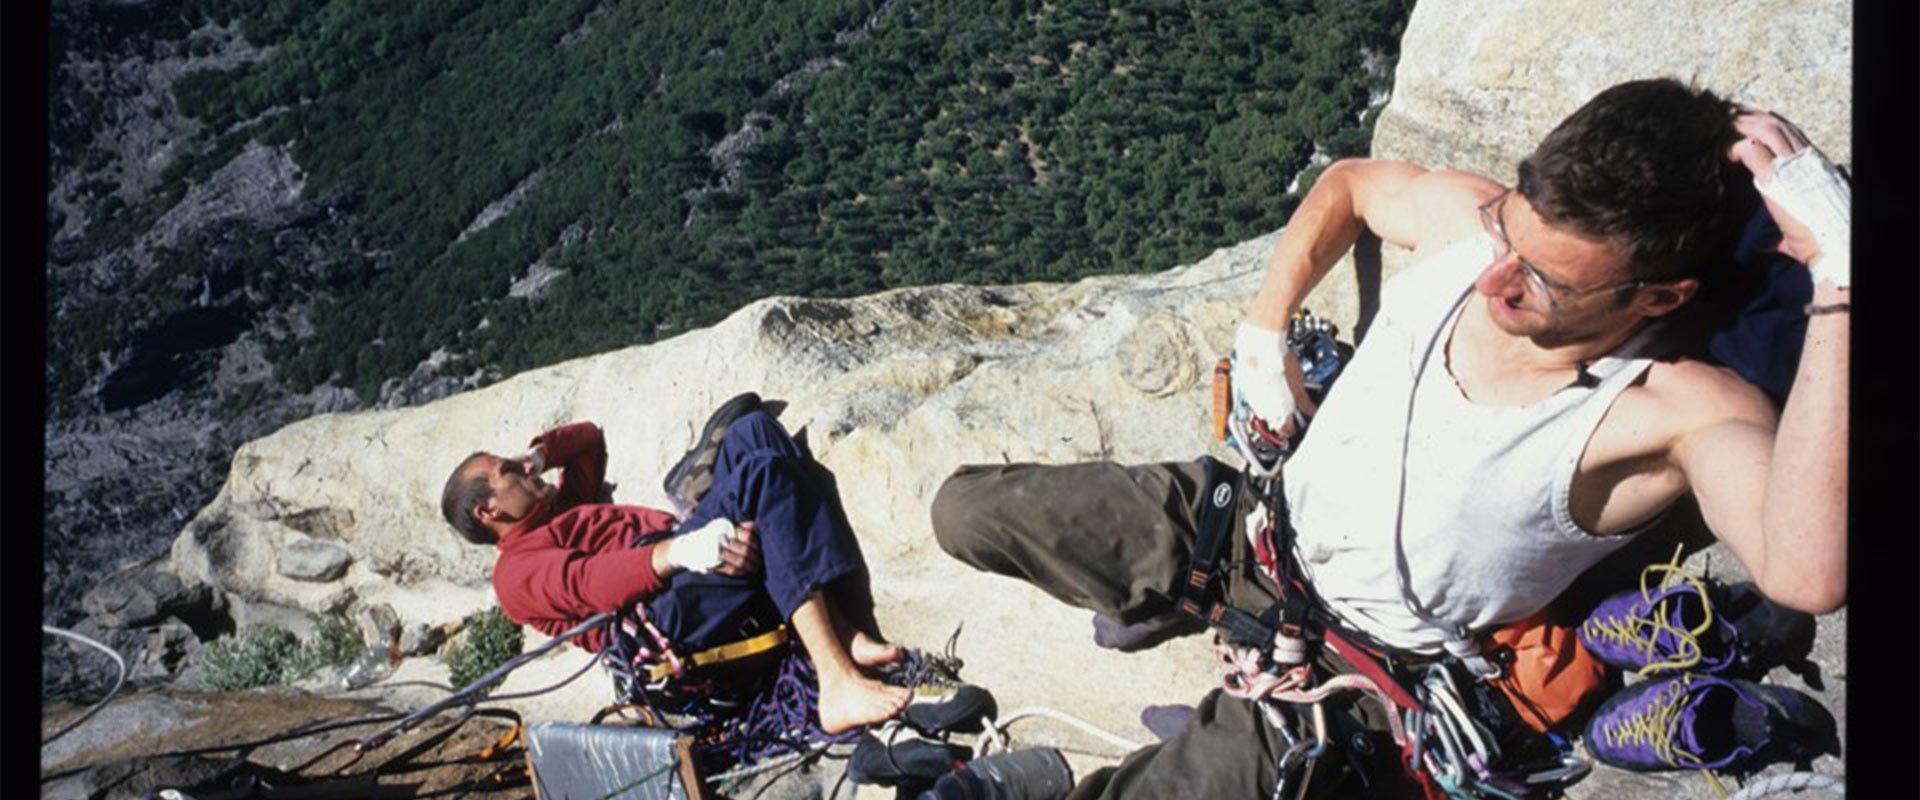 vimff best of climbing online salathe title bg